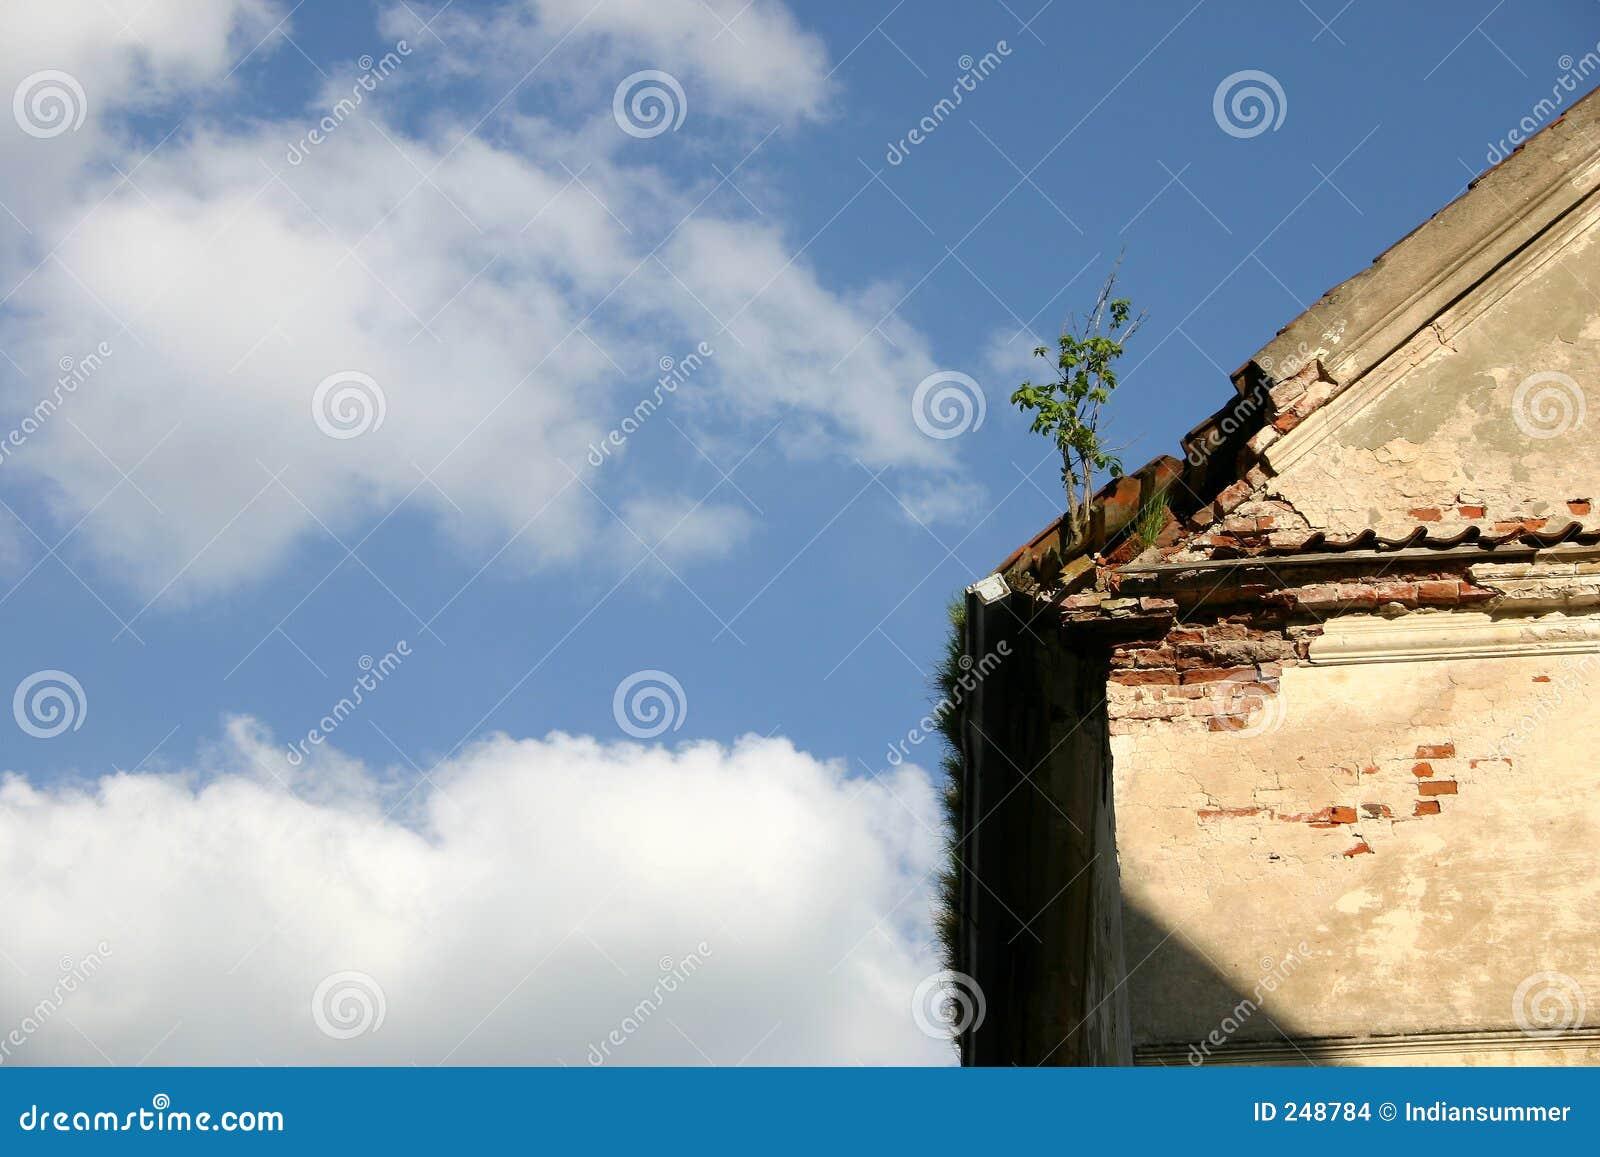 W domu na dach niebo